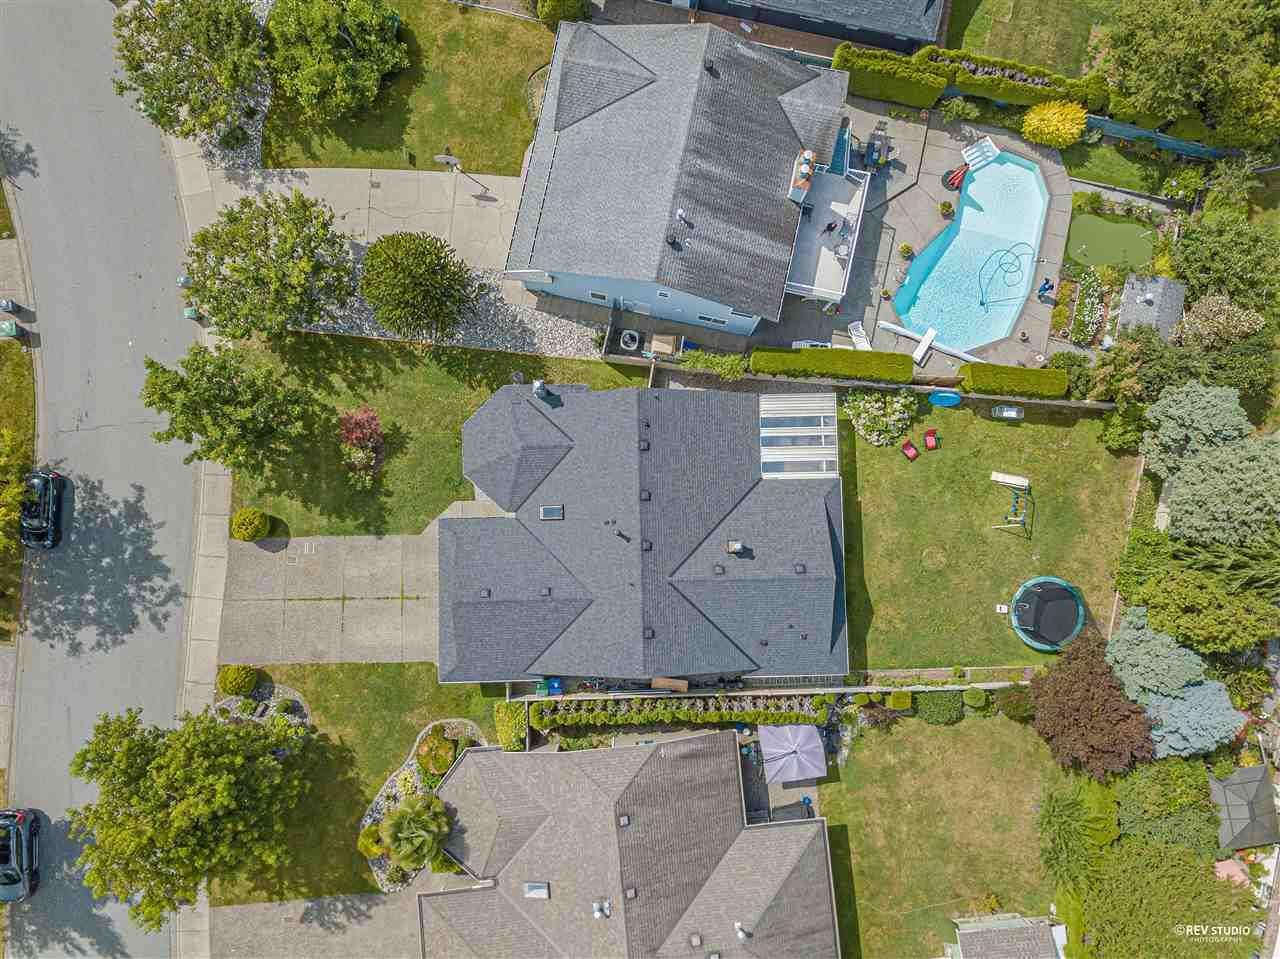 Photo 7: Photos: 15423 93 Avenue in Surrey: Fleetwood Tynehead House for sale : MLS®# R2488101